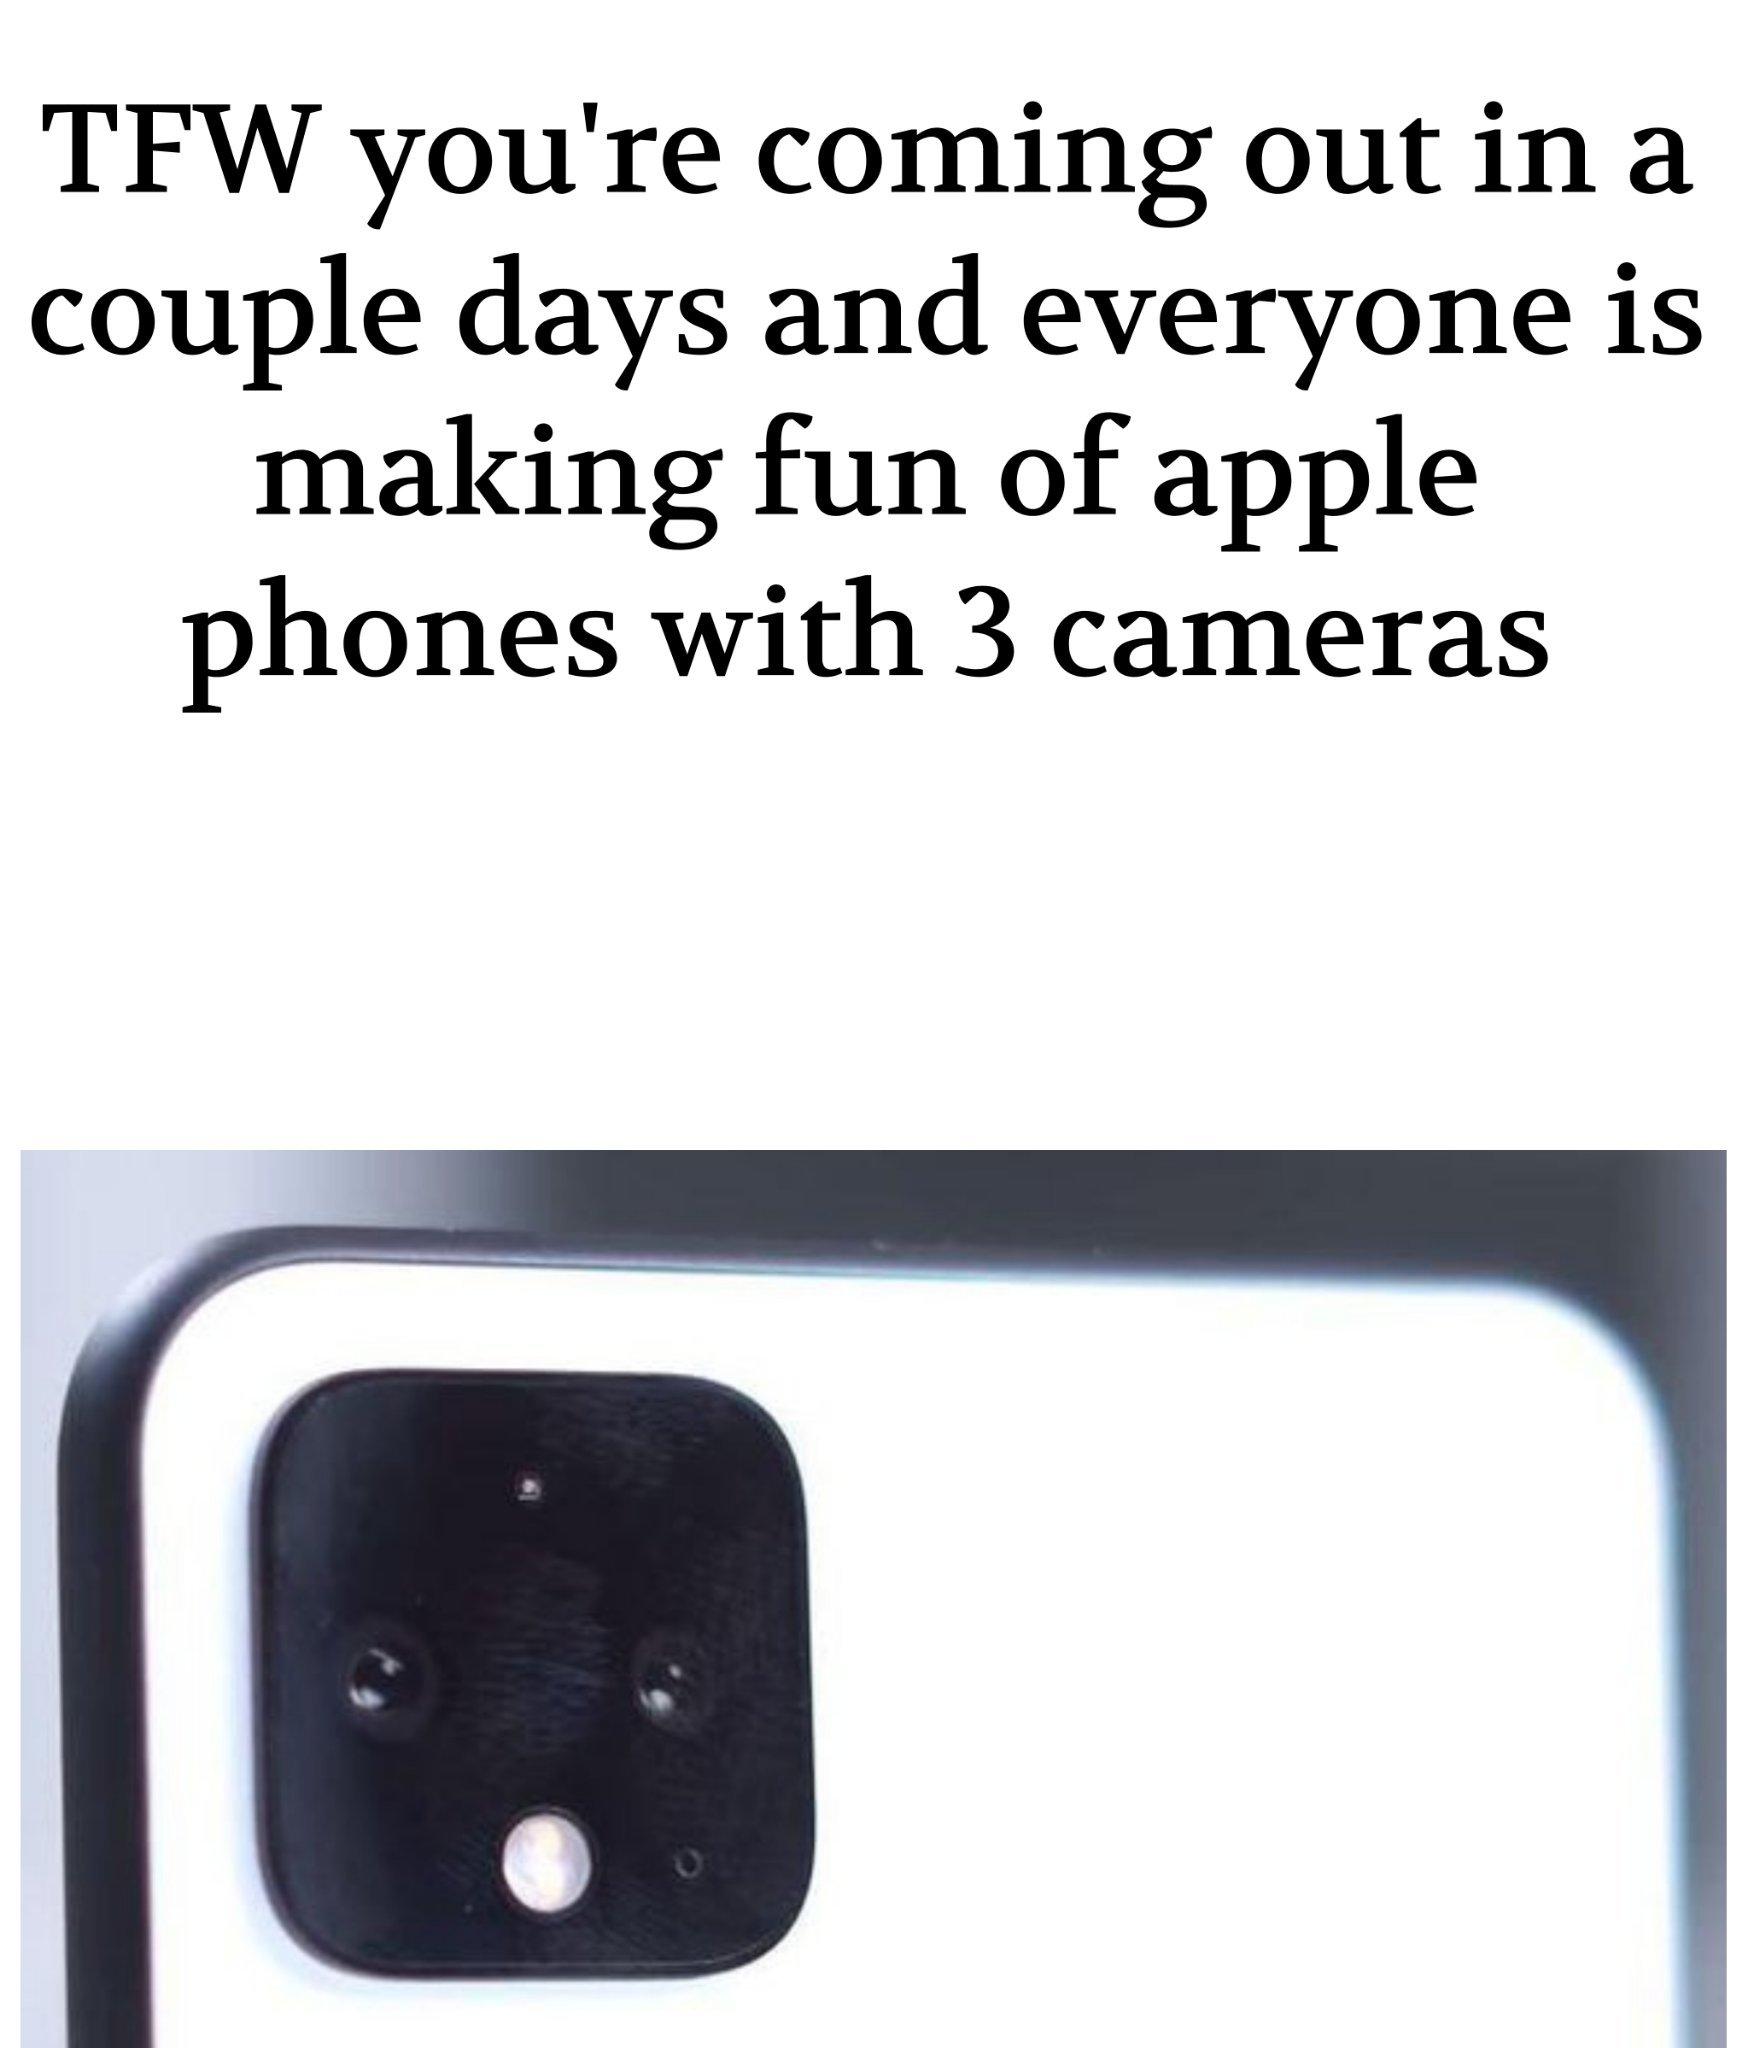 Dongs on a phone - meme